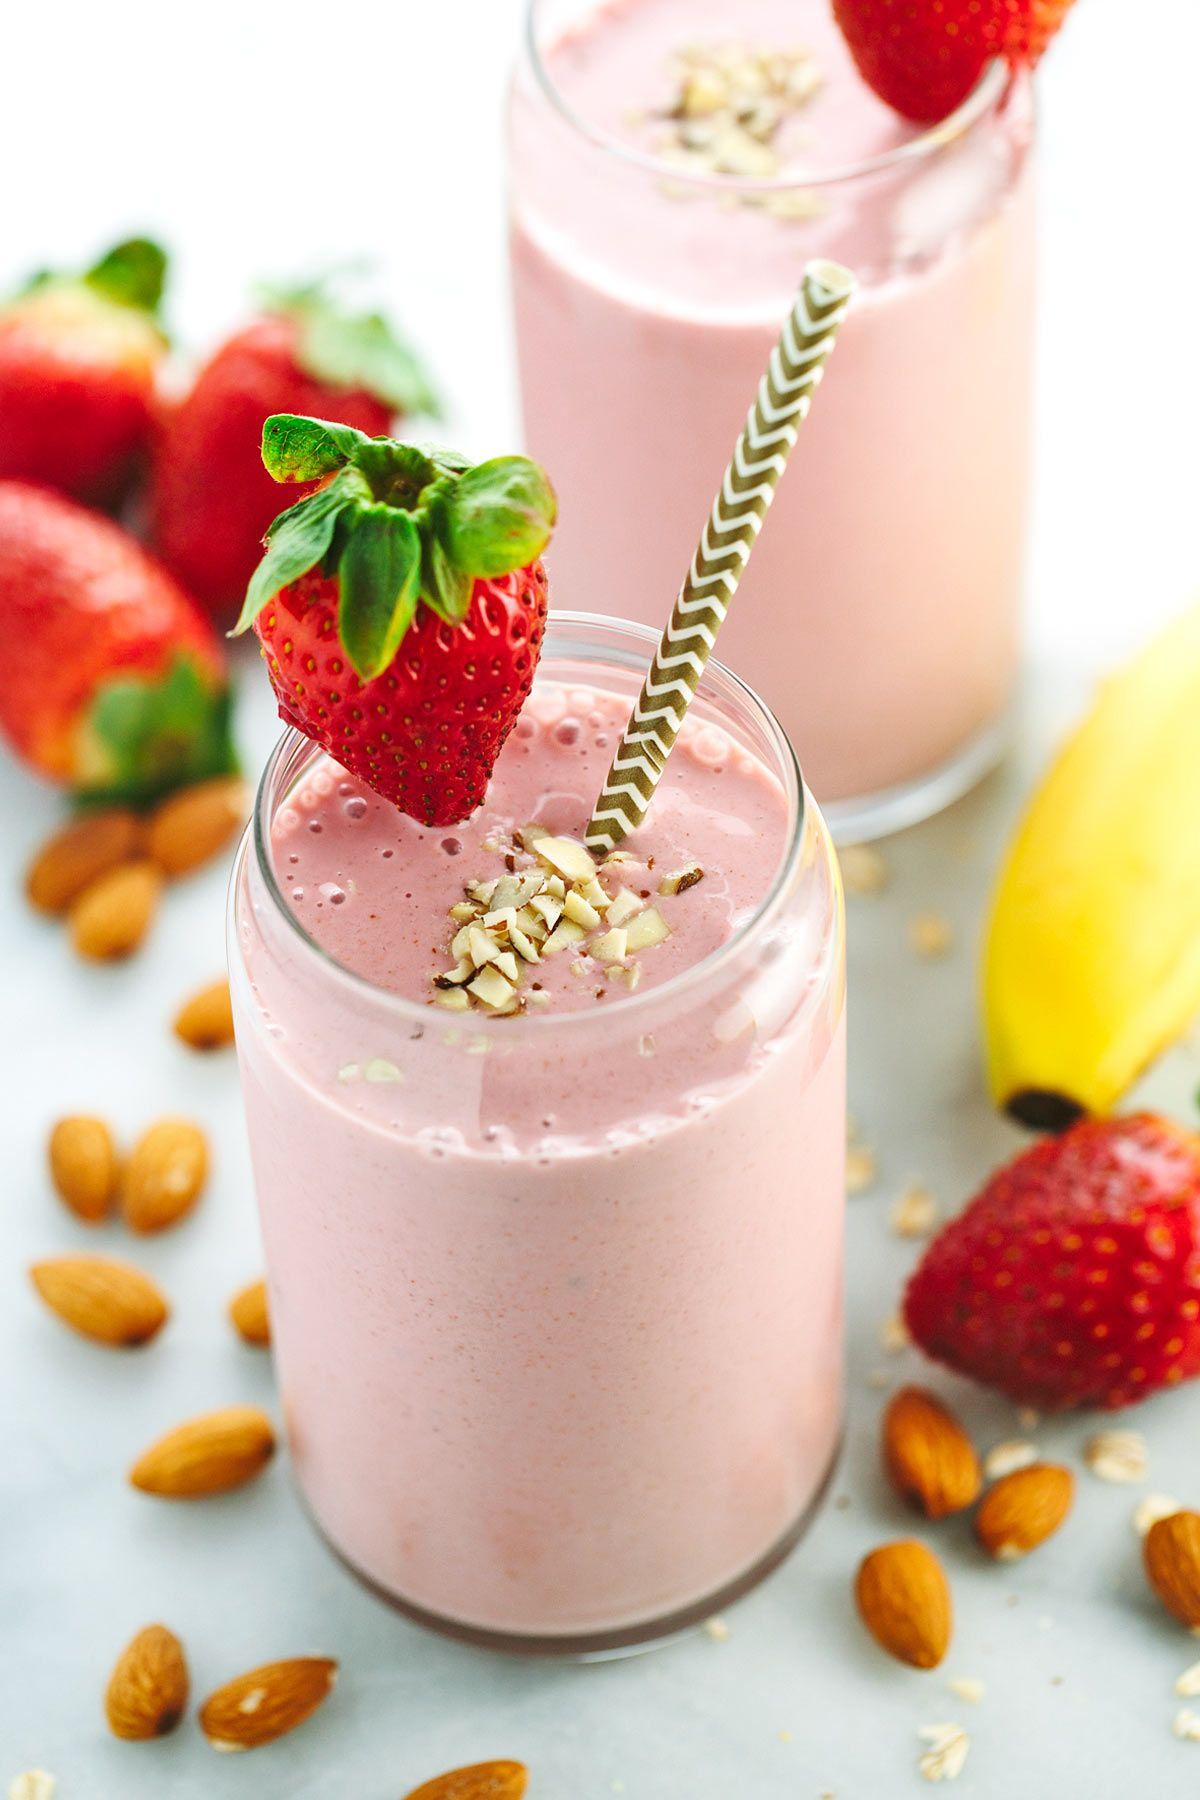 Strawberry Banana Smoothie With Almond Milk Recipe